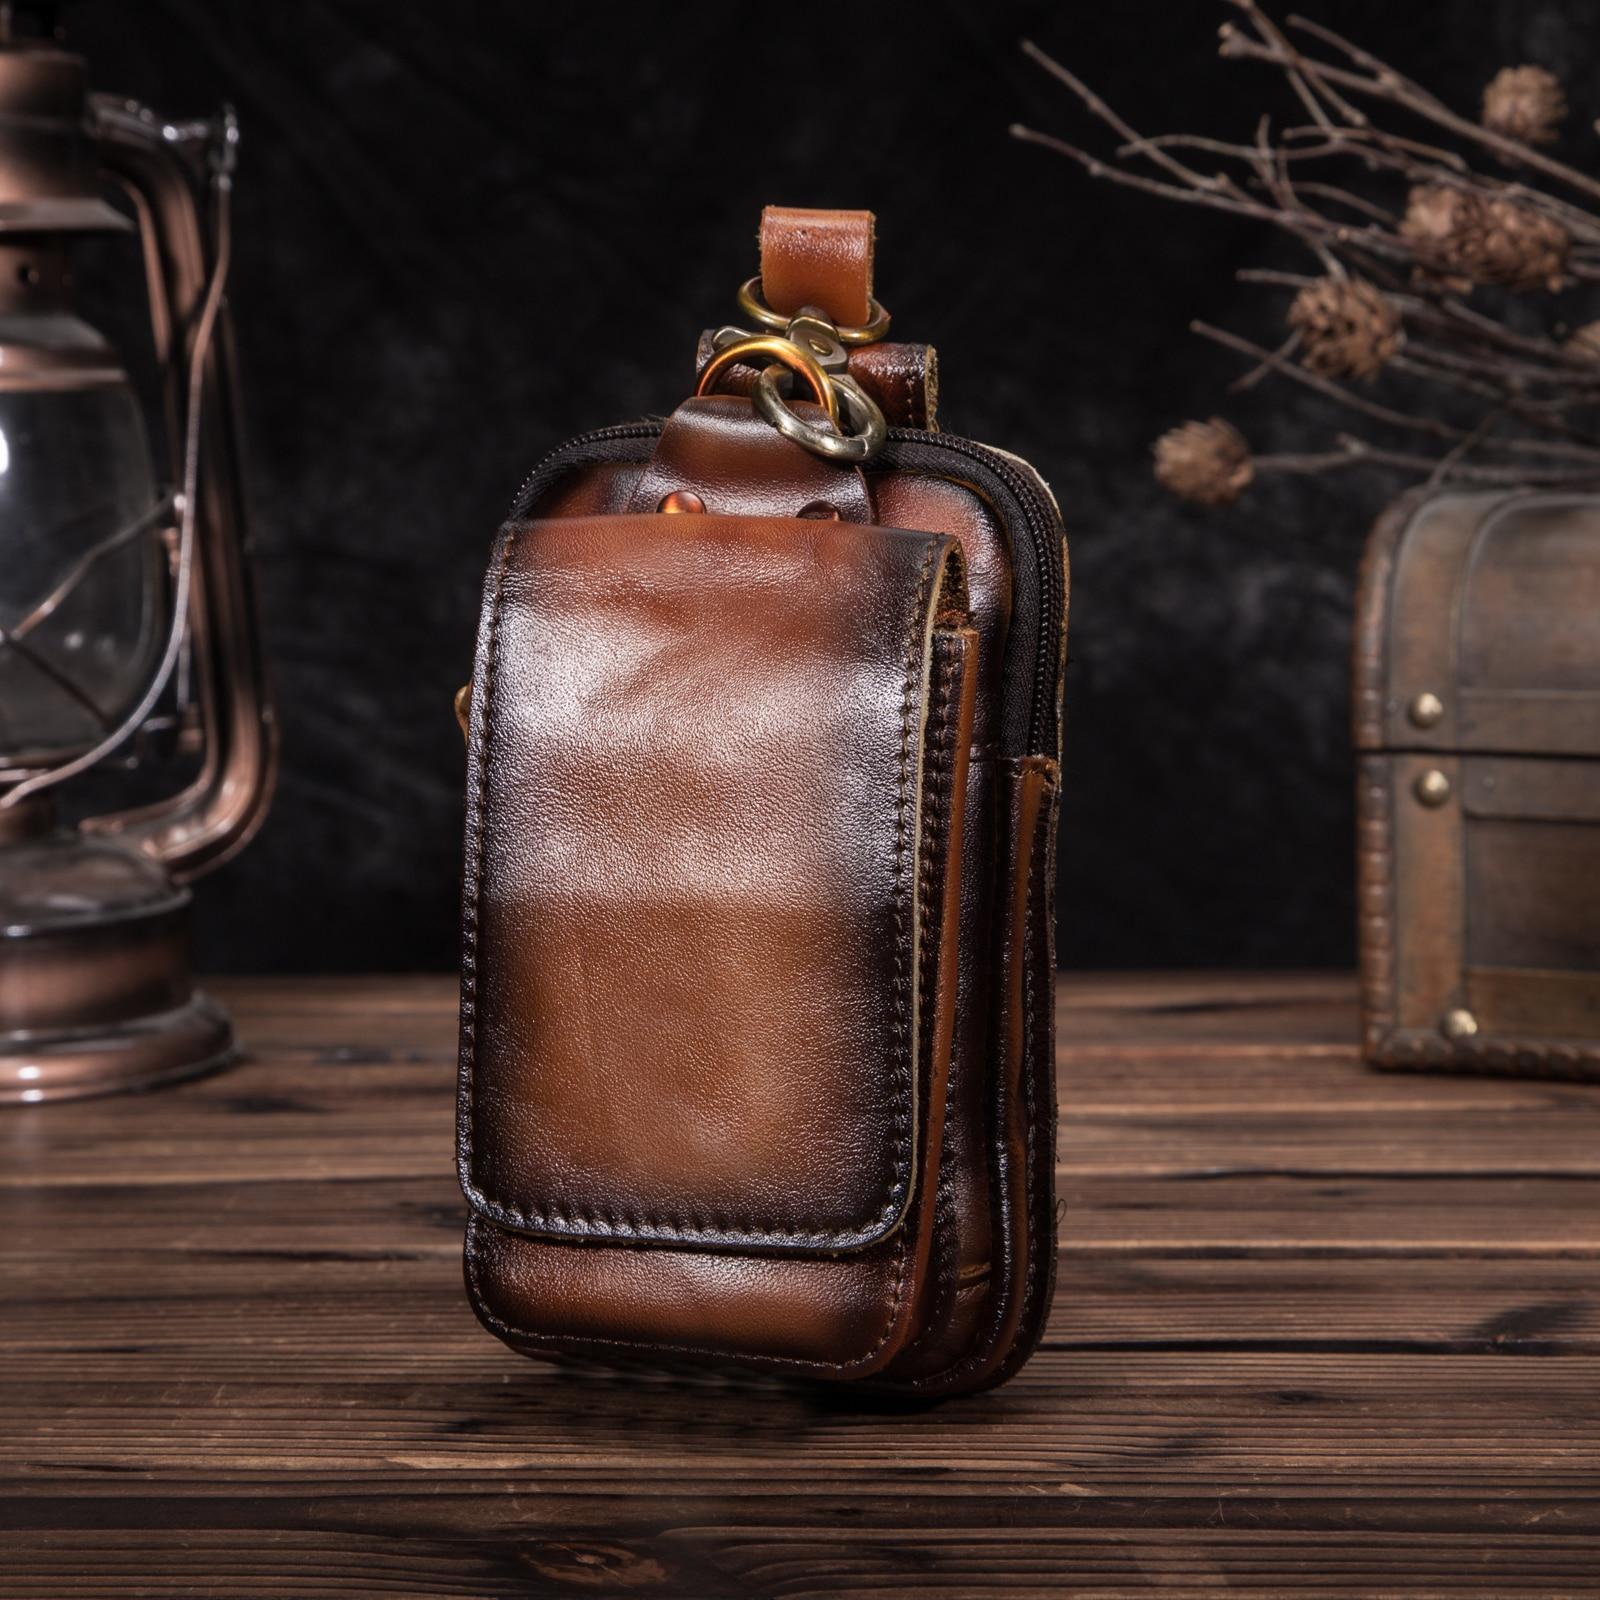 Fashion Original Leather Small Summer Pouch Hook Design Waist Pack Bag Cigarette Case 6